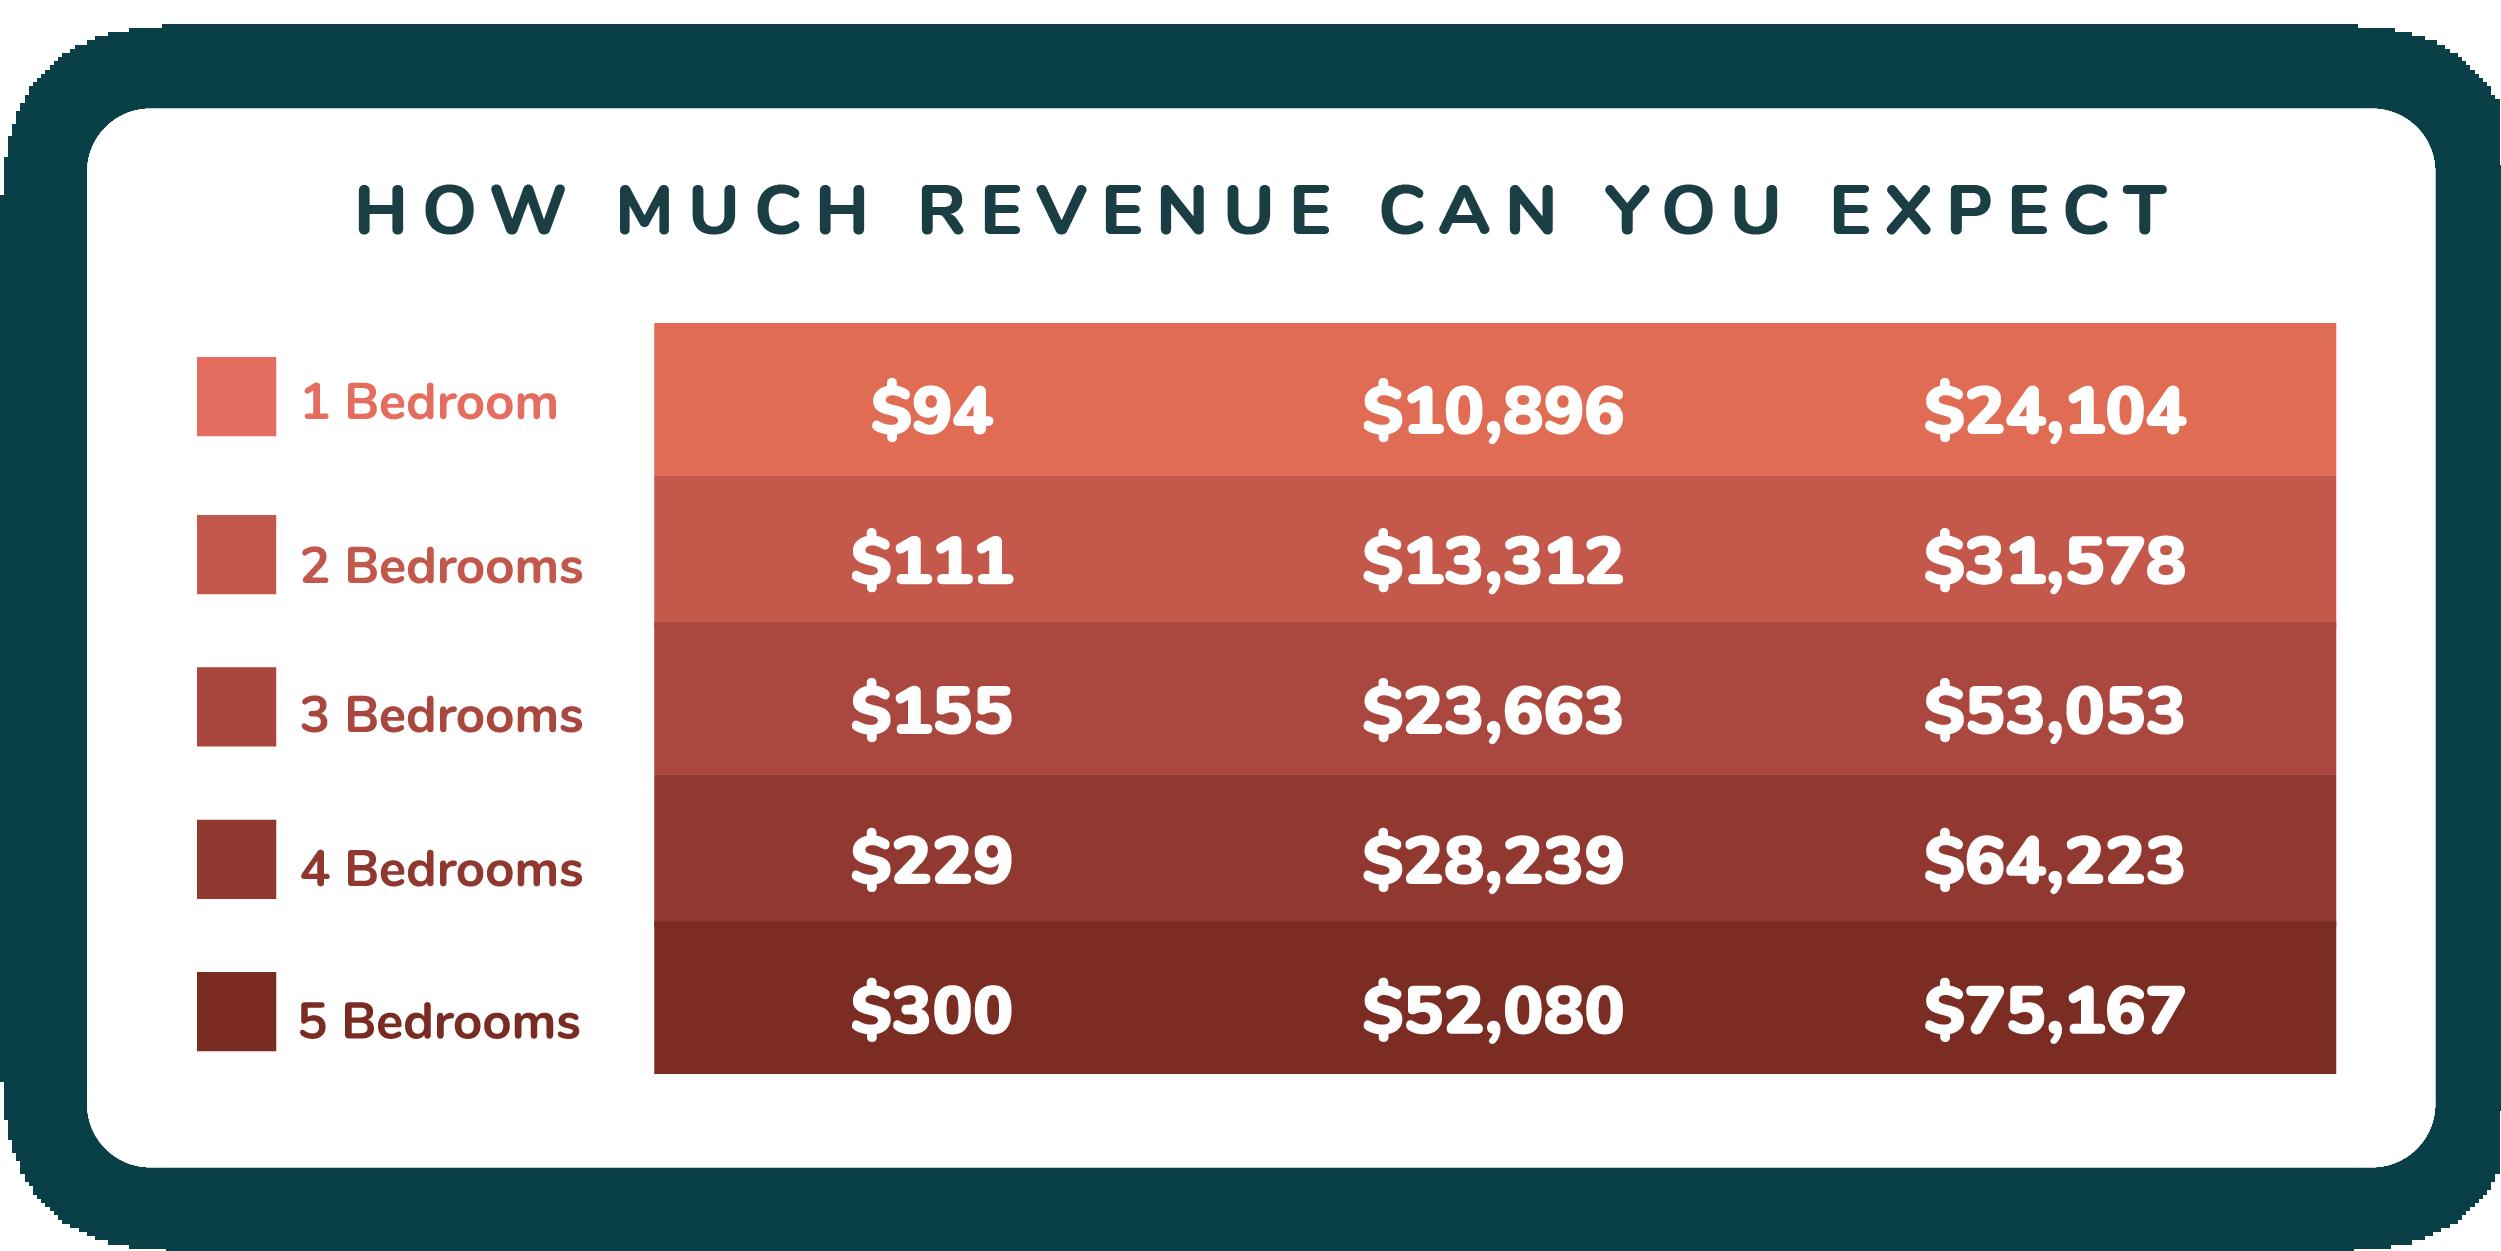 Myrtle Beach vacation rental revenue estimate graph, broken out by bedroom count